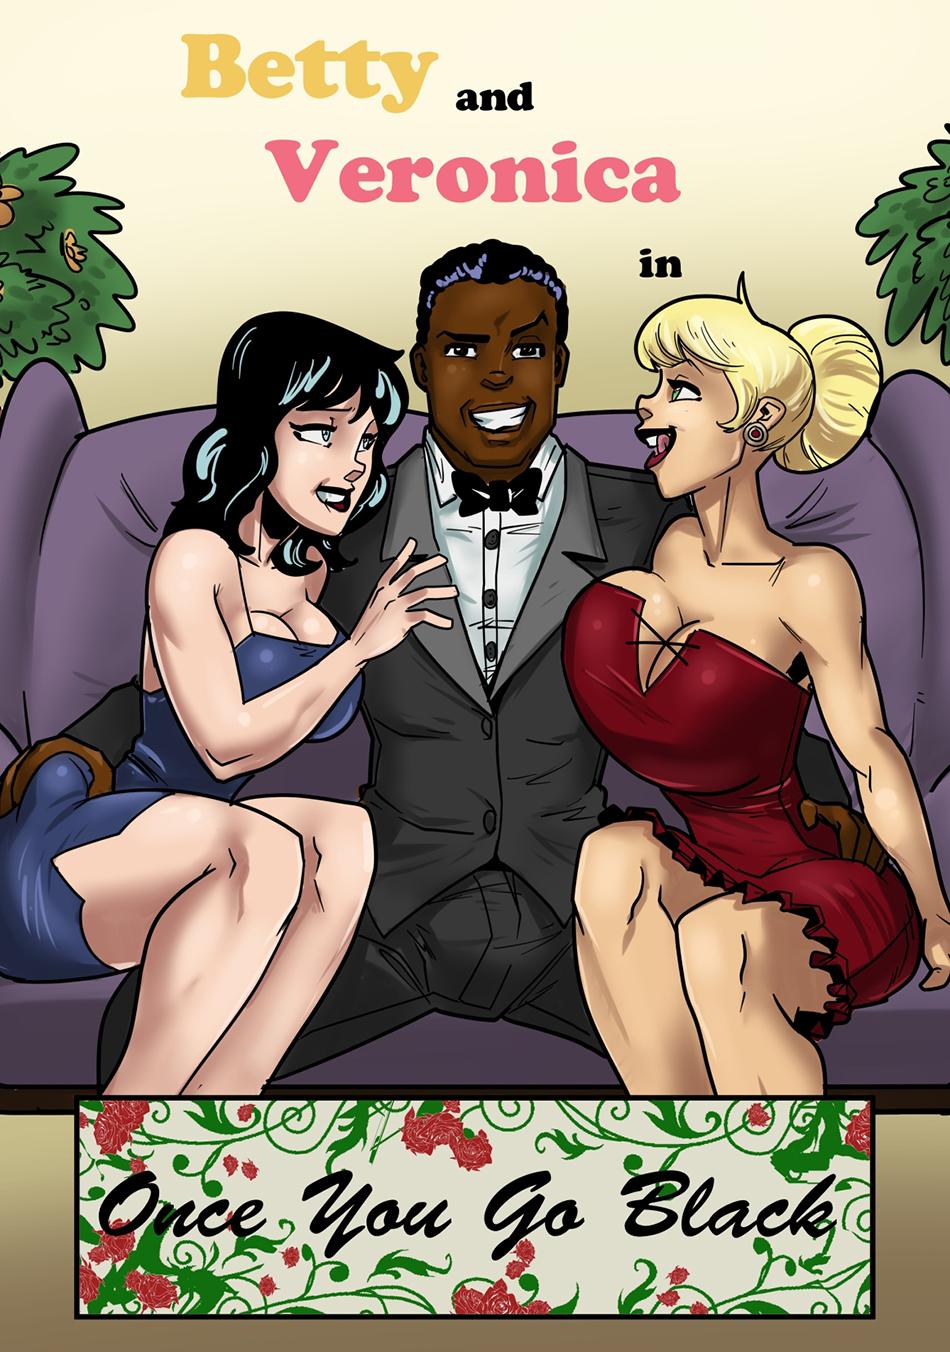 SureFap xxx porno The Archie - [KennyComix][Rabies T Lagomorph (Entropy)] - Betty and Veronica Once You Go Black